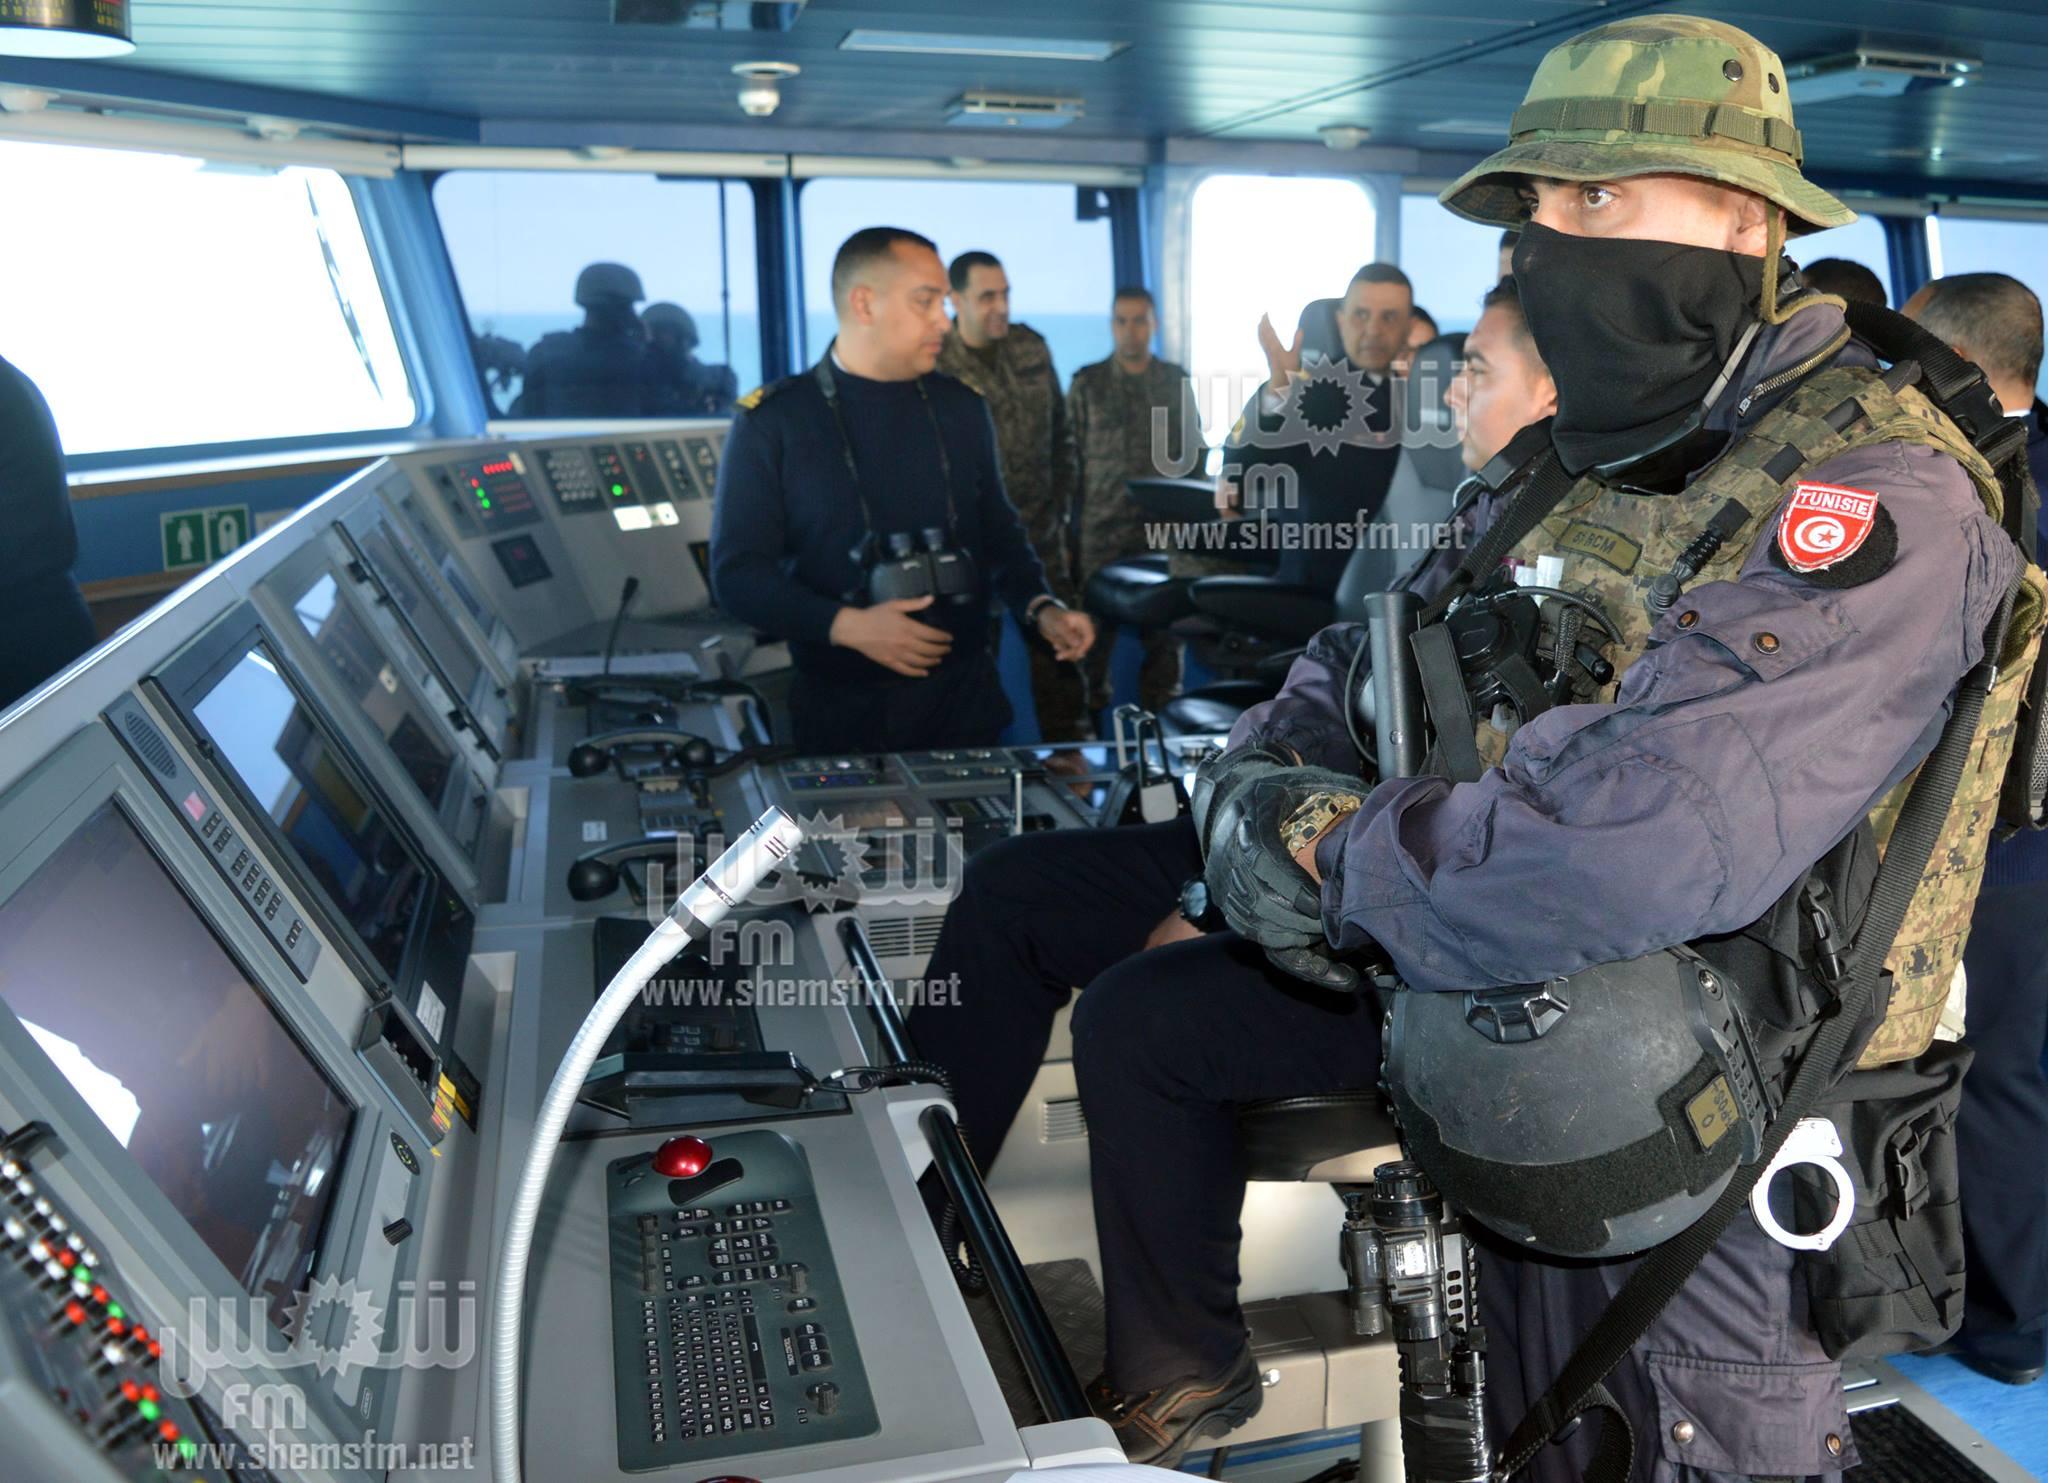 Armée Tunisienne / Tunisian Armed Forces / القوات المسلحة التونسية - Page 16 57425270-2455595384461732-4994507972622155776-o